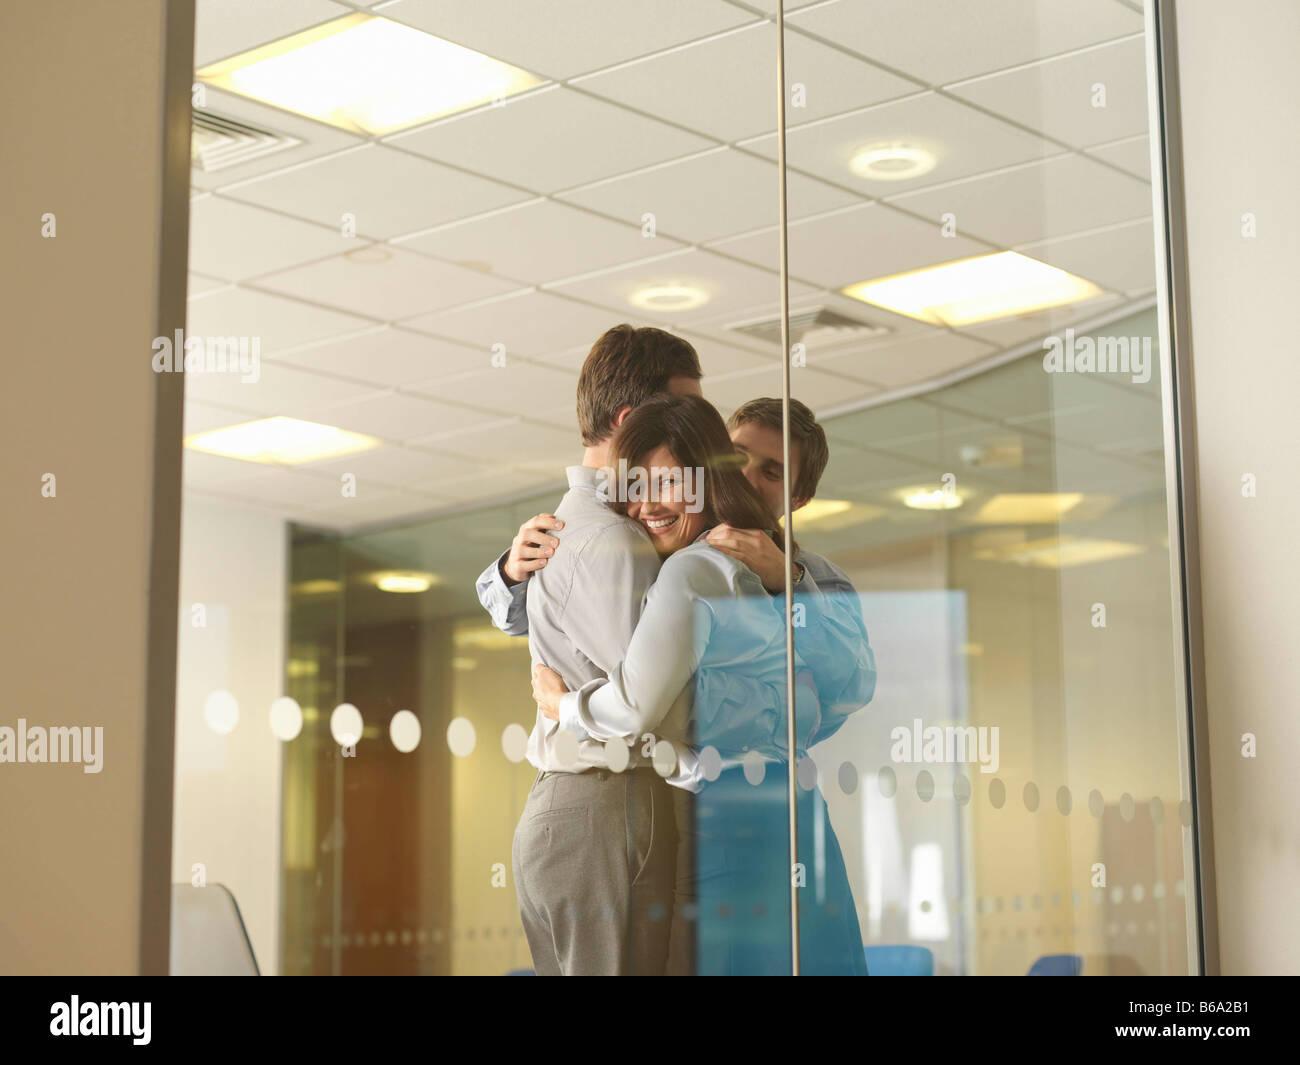 Office staff group hug - Stock Image